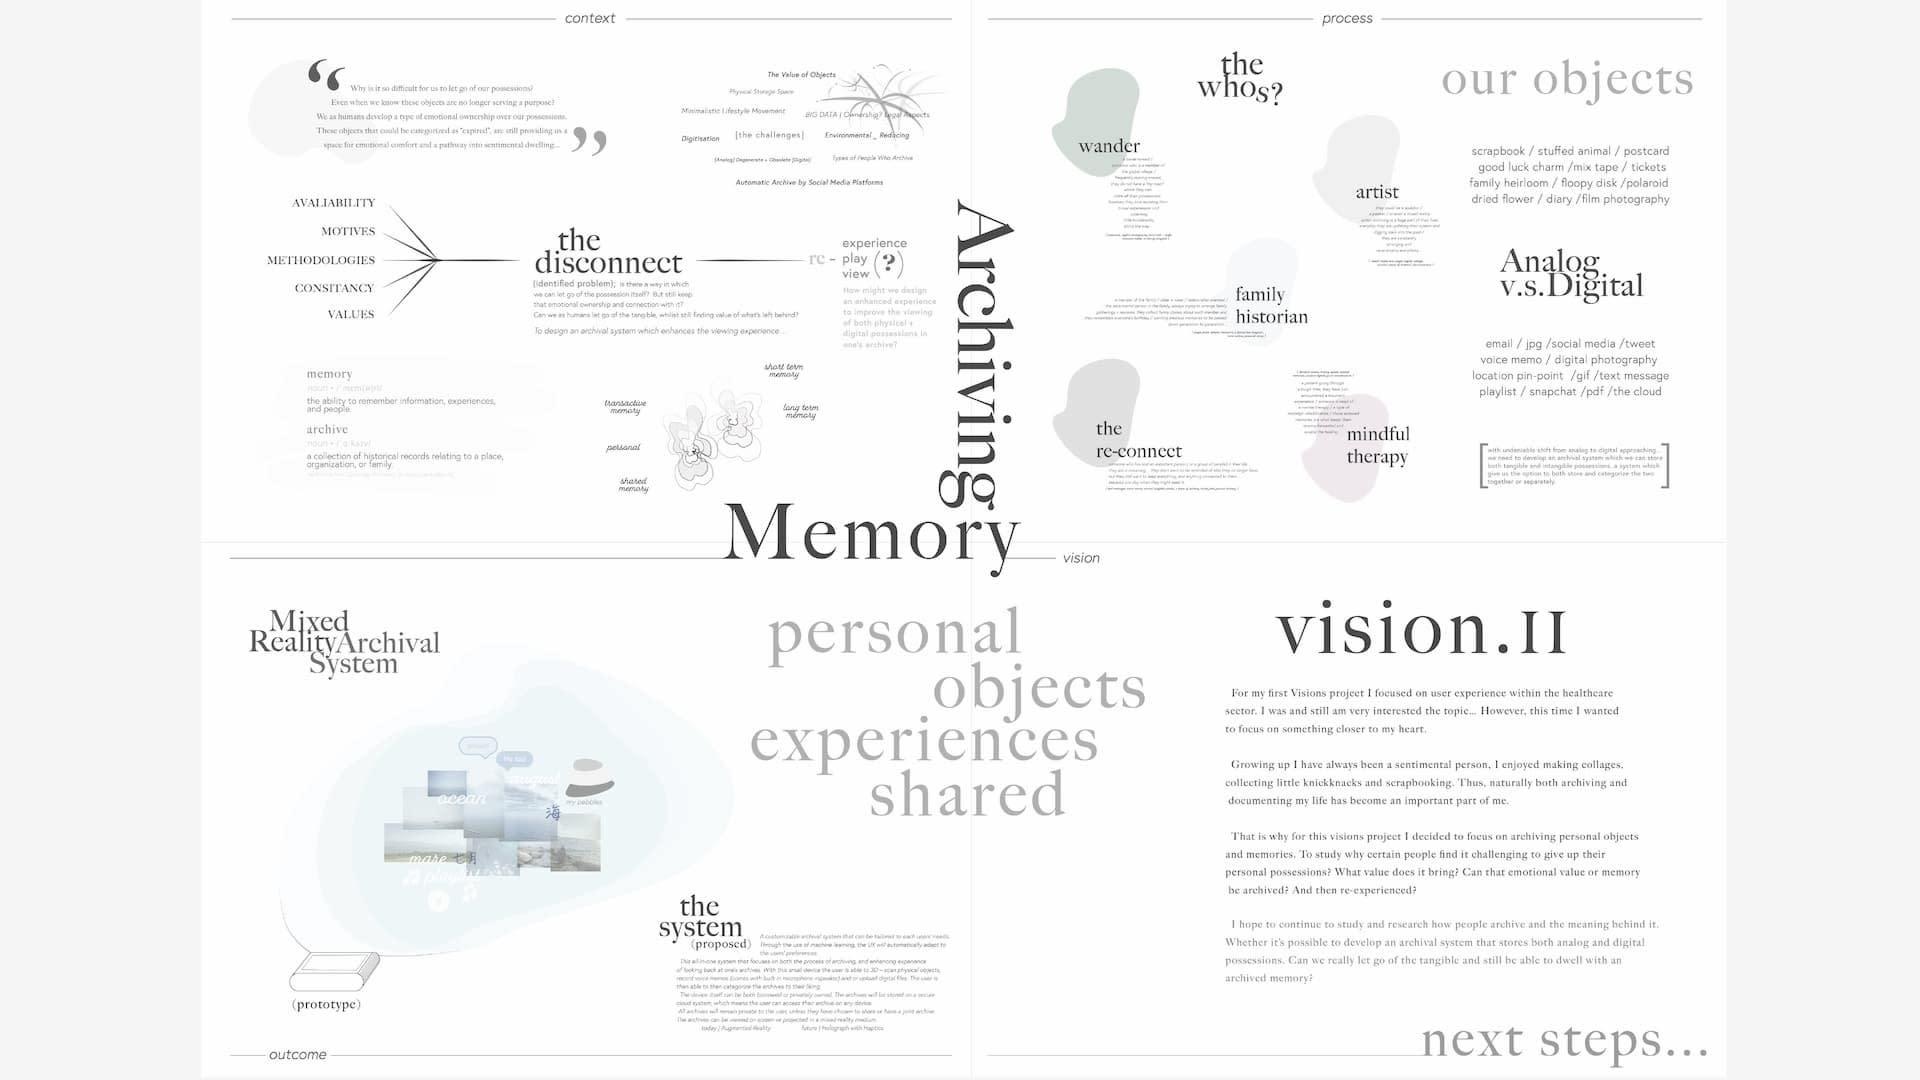 — GID Project Series: Archiving Memories